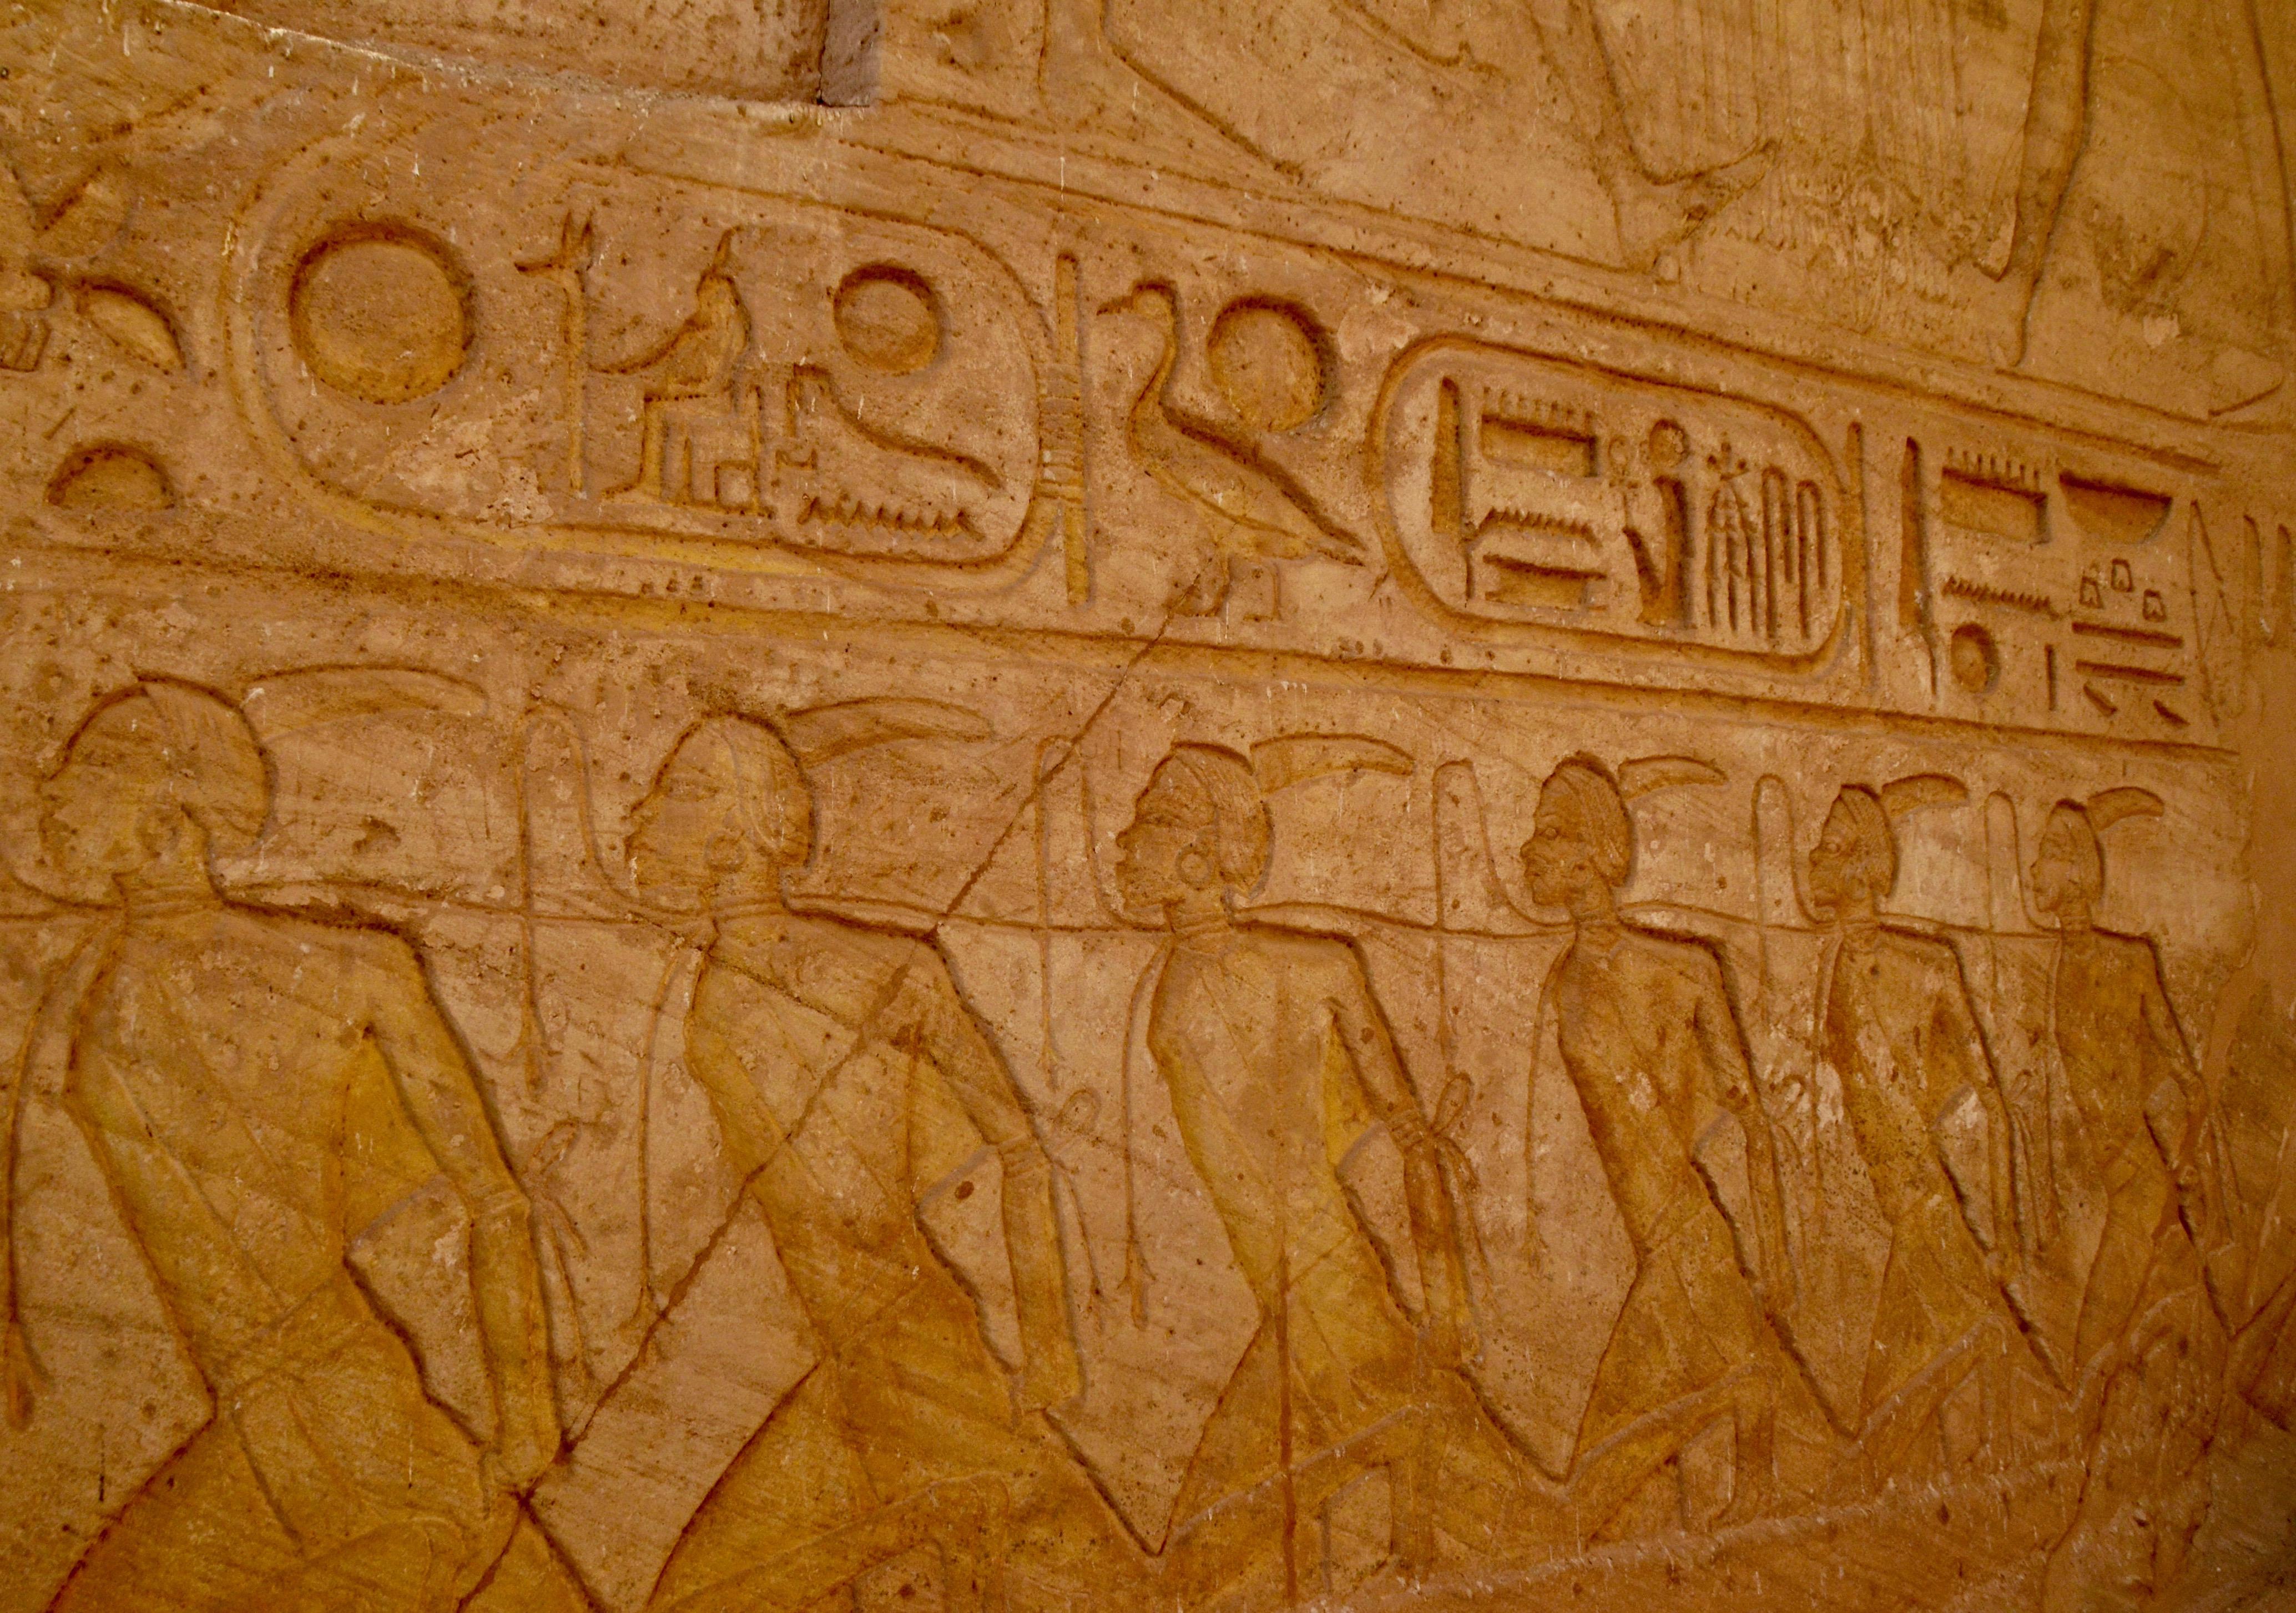 African Prisoners, Abu Simbel